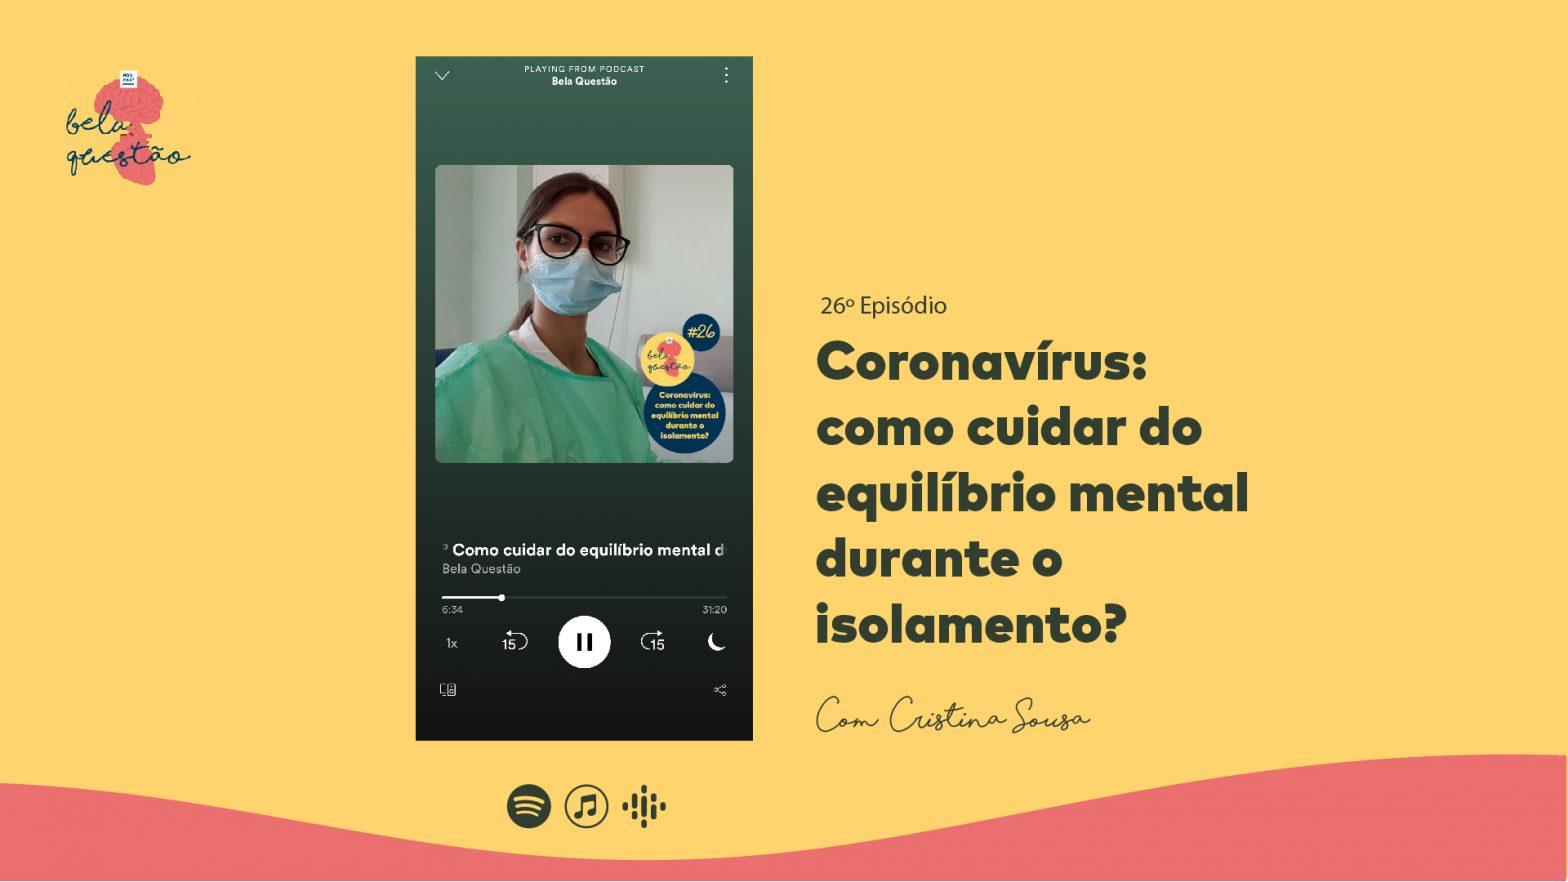 26º Coronavírus: como cuidar do equilíbrio mental durante o isolamento?